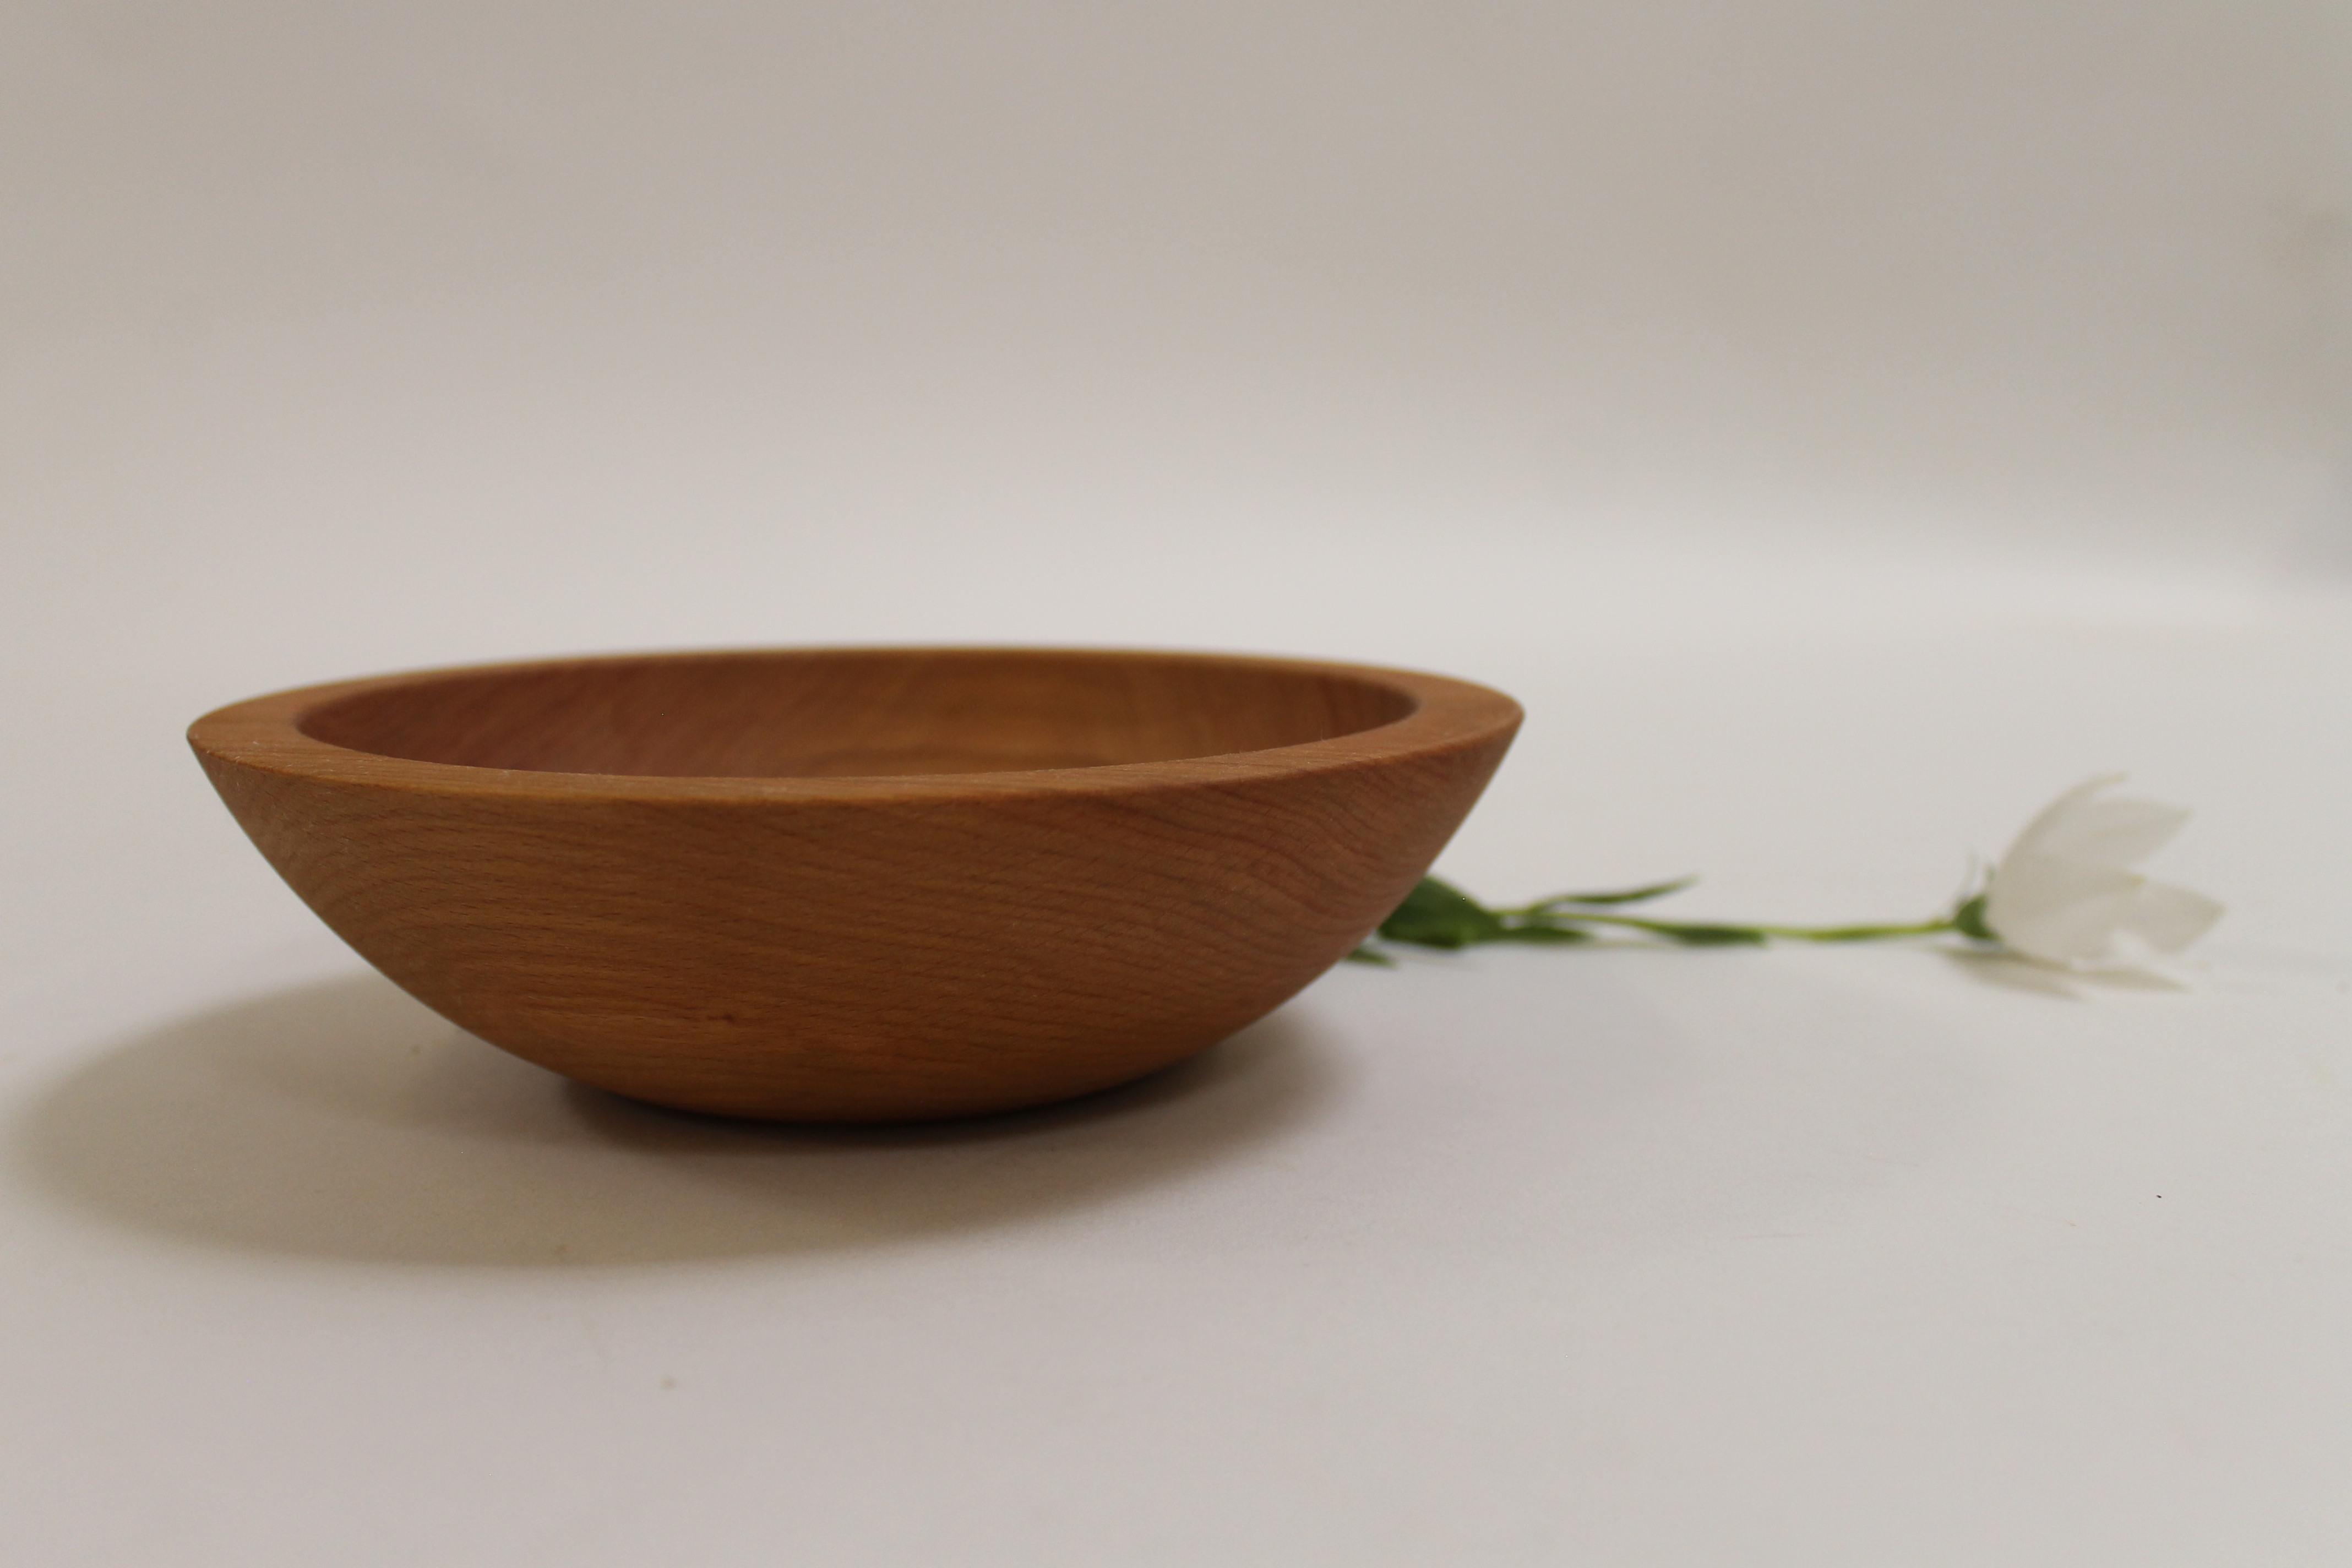 7 inch Beech Bowl - Bee's Oil Finish 107B